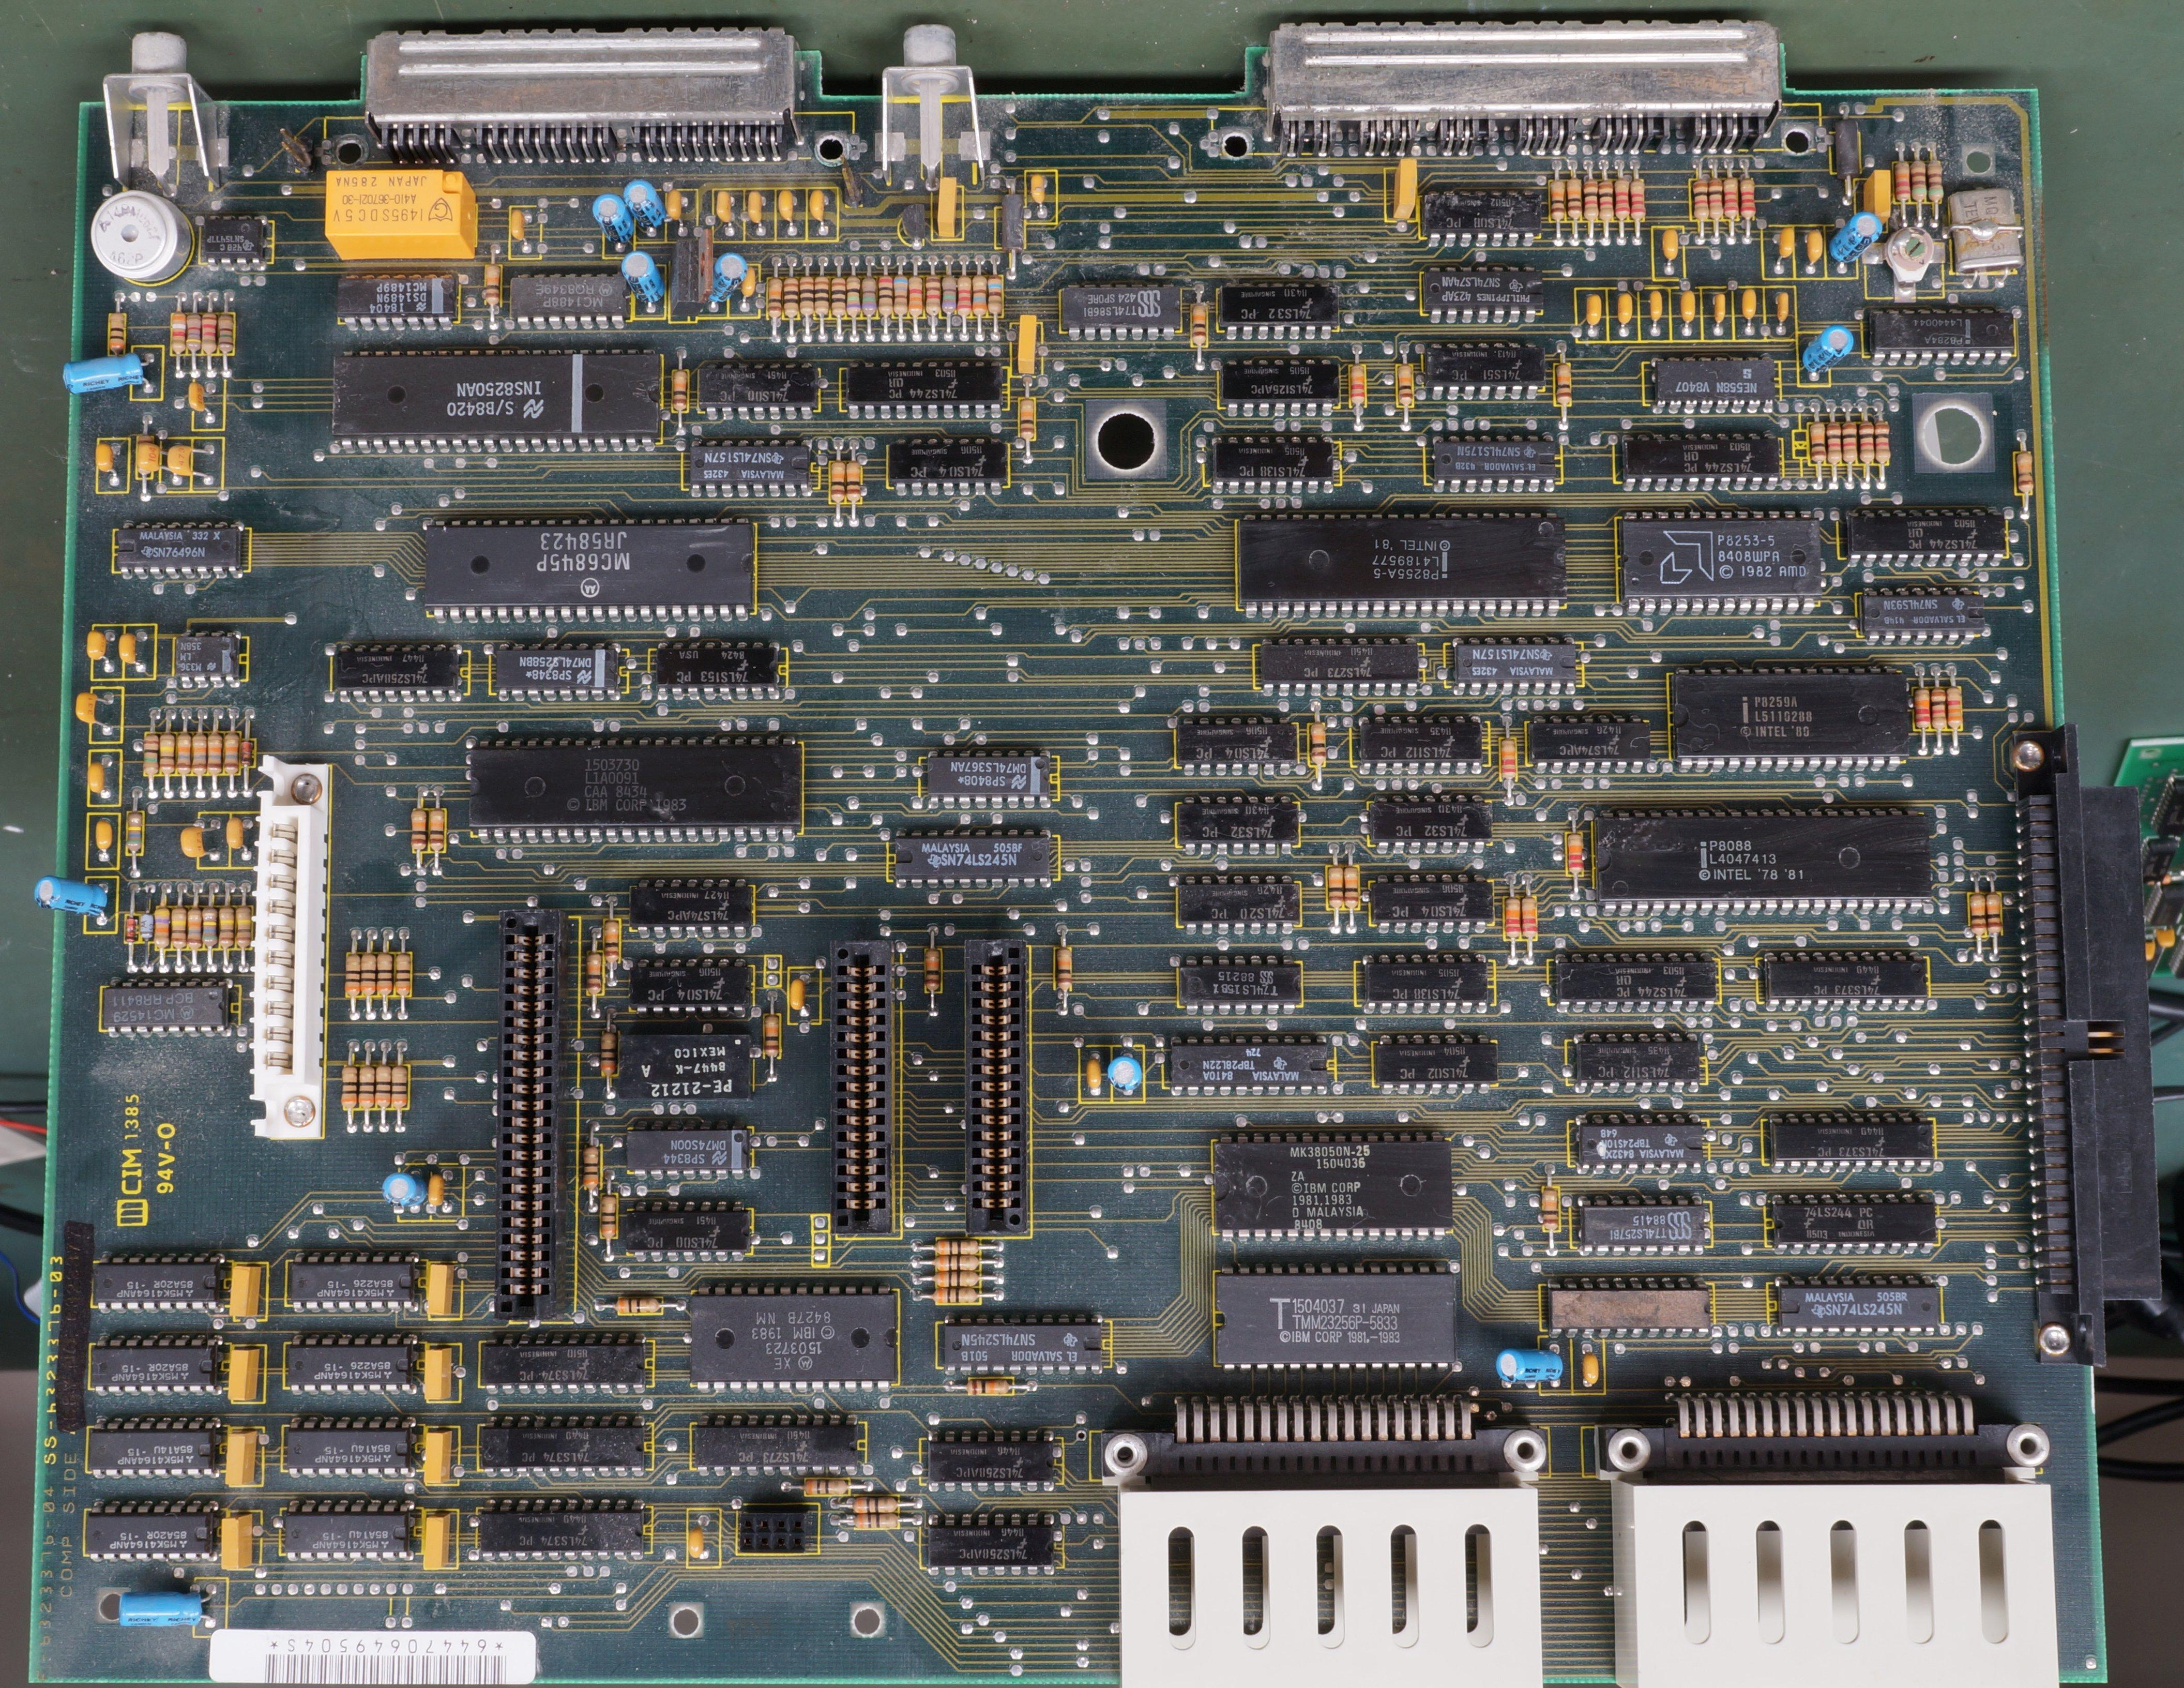 Fileibm Pcb Jr Motherboard Wikipedia Electronic Circuit